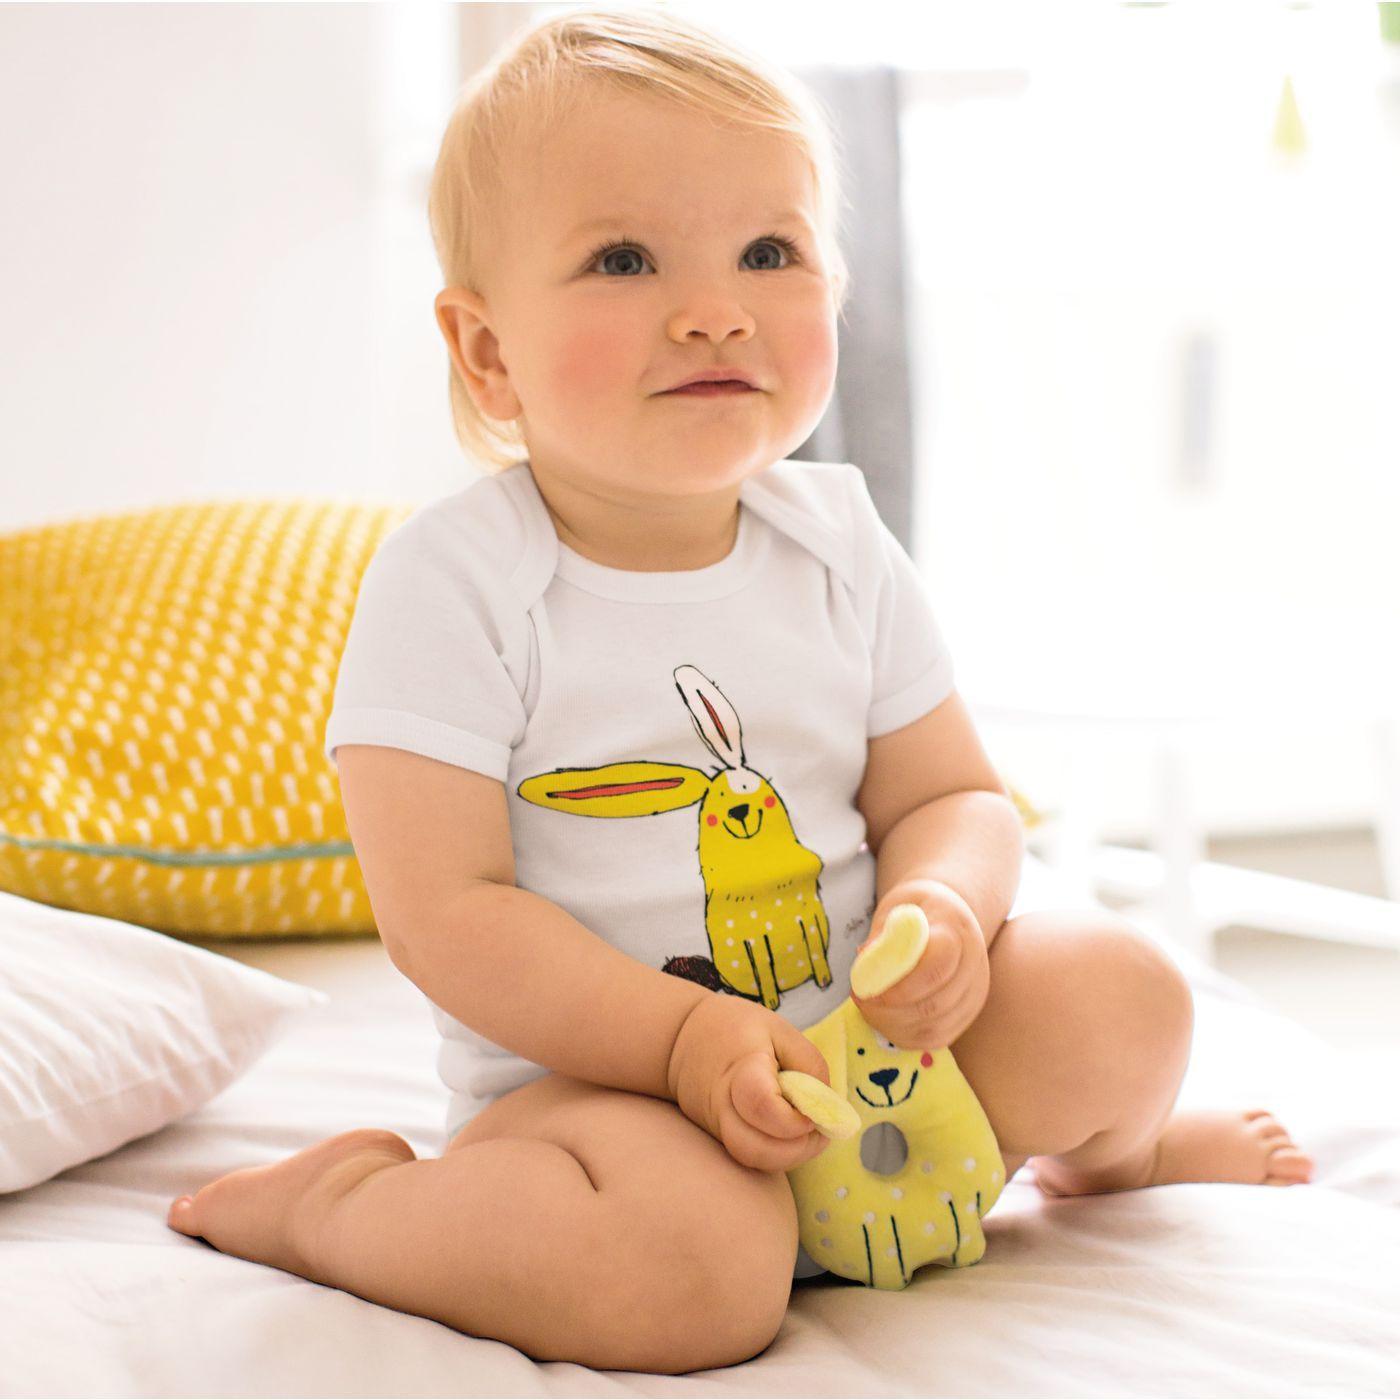 Baby Body Bedruckt Tier Motiv Online Bestellen Jako O Design